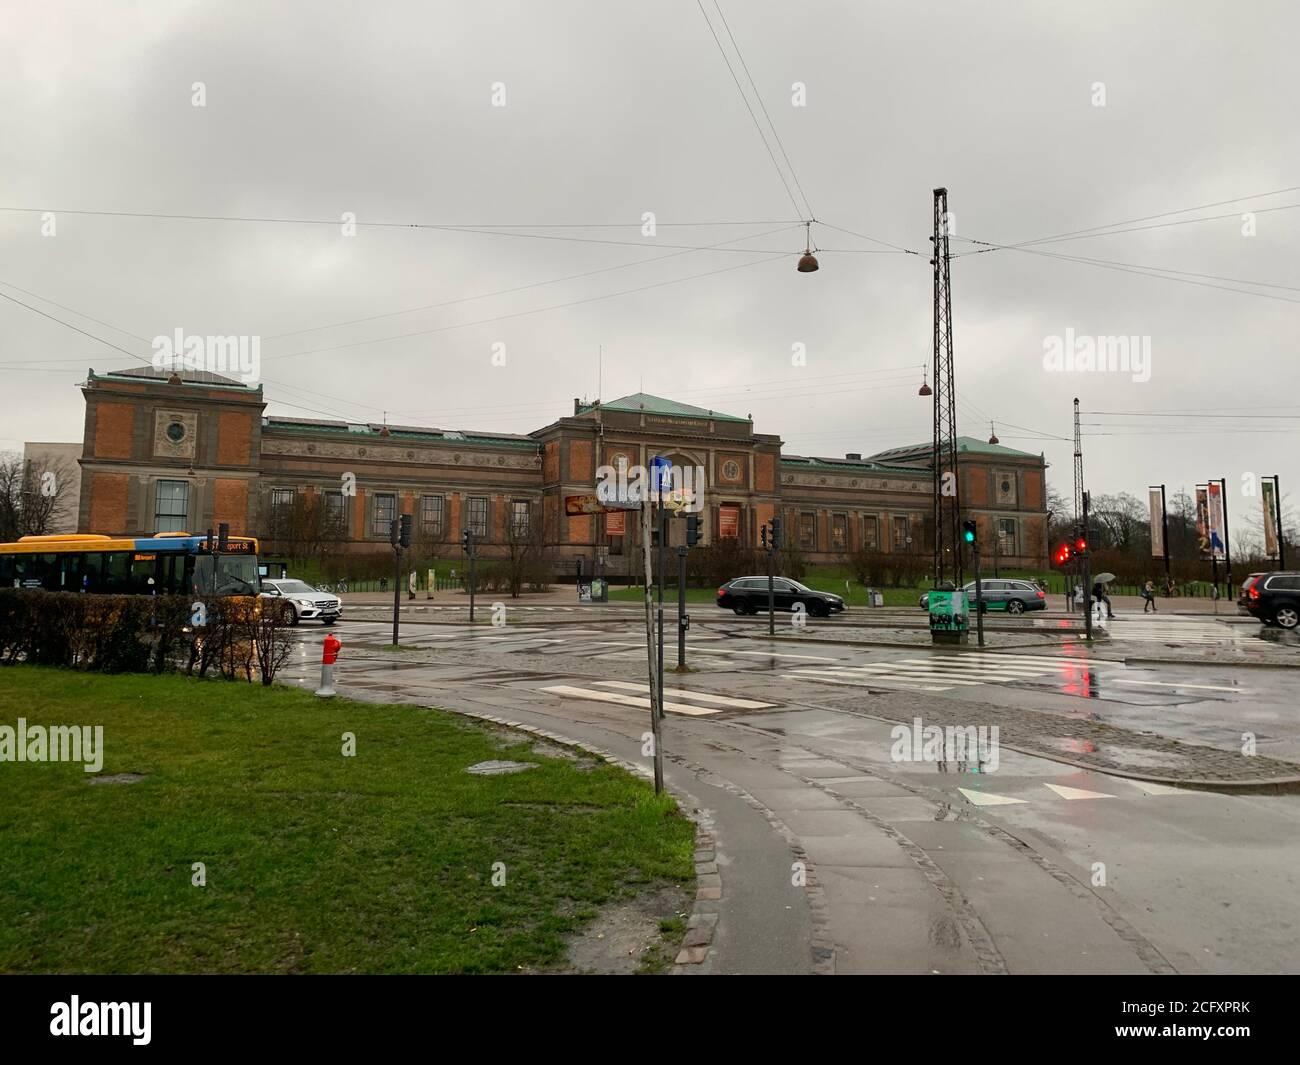 Fachada del museo SMK (Statens Museum for Kunst). Copenhague/ Dinamarca Foto de stock